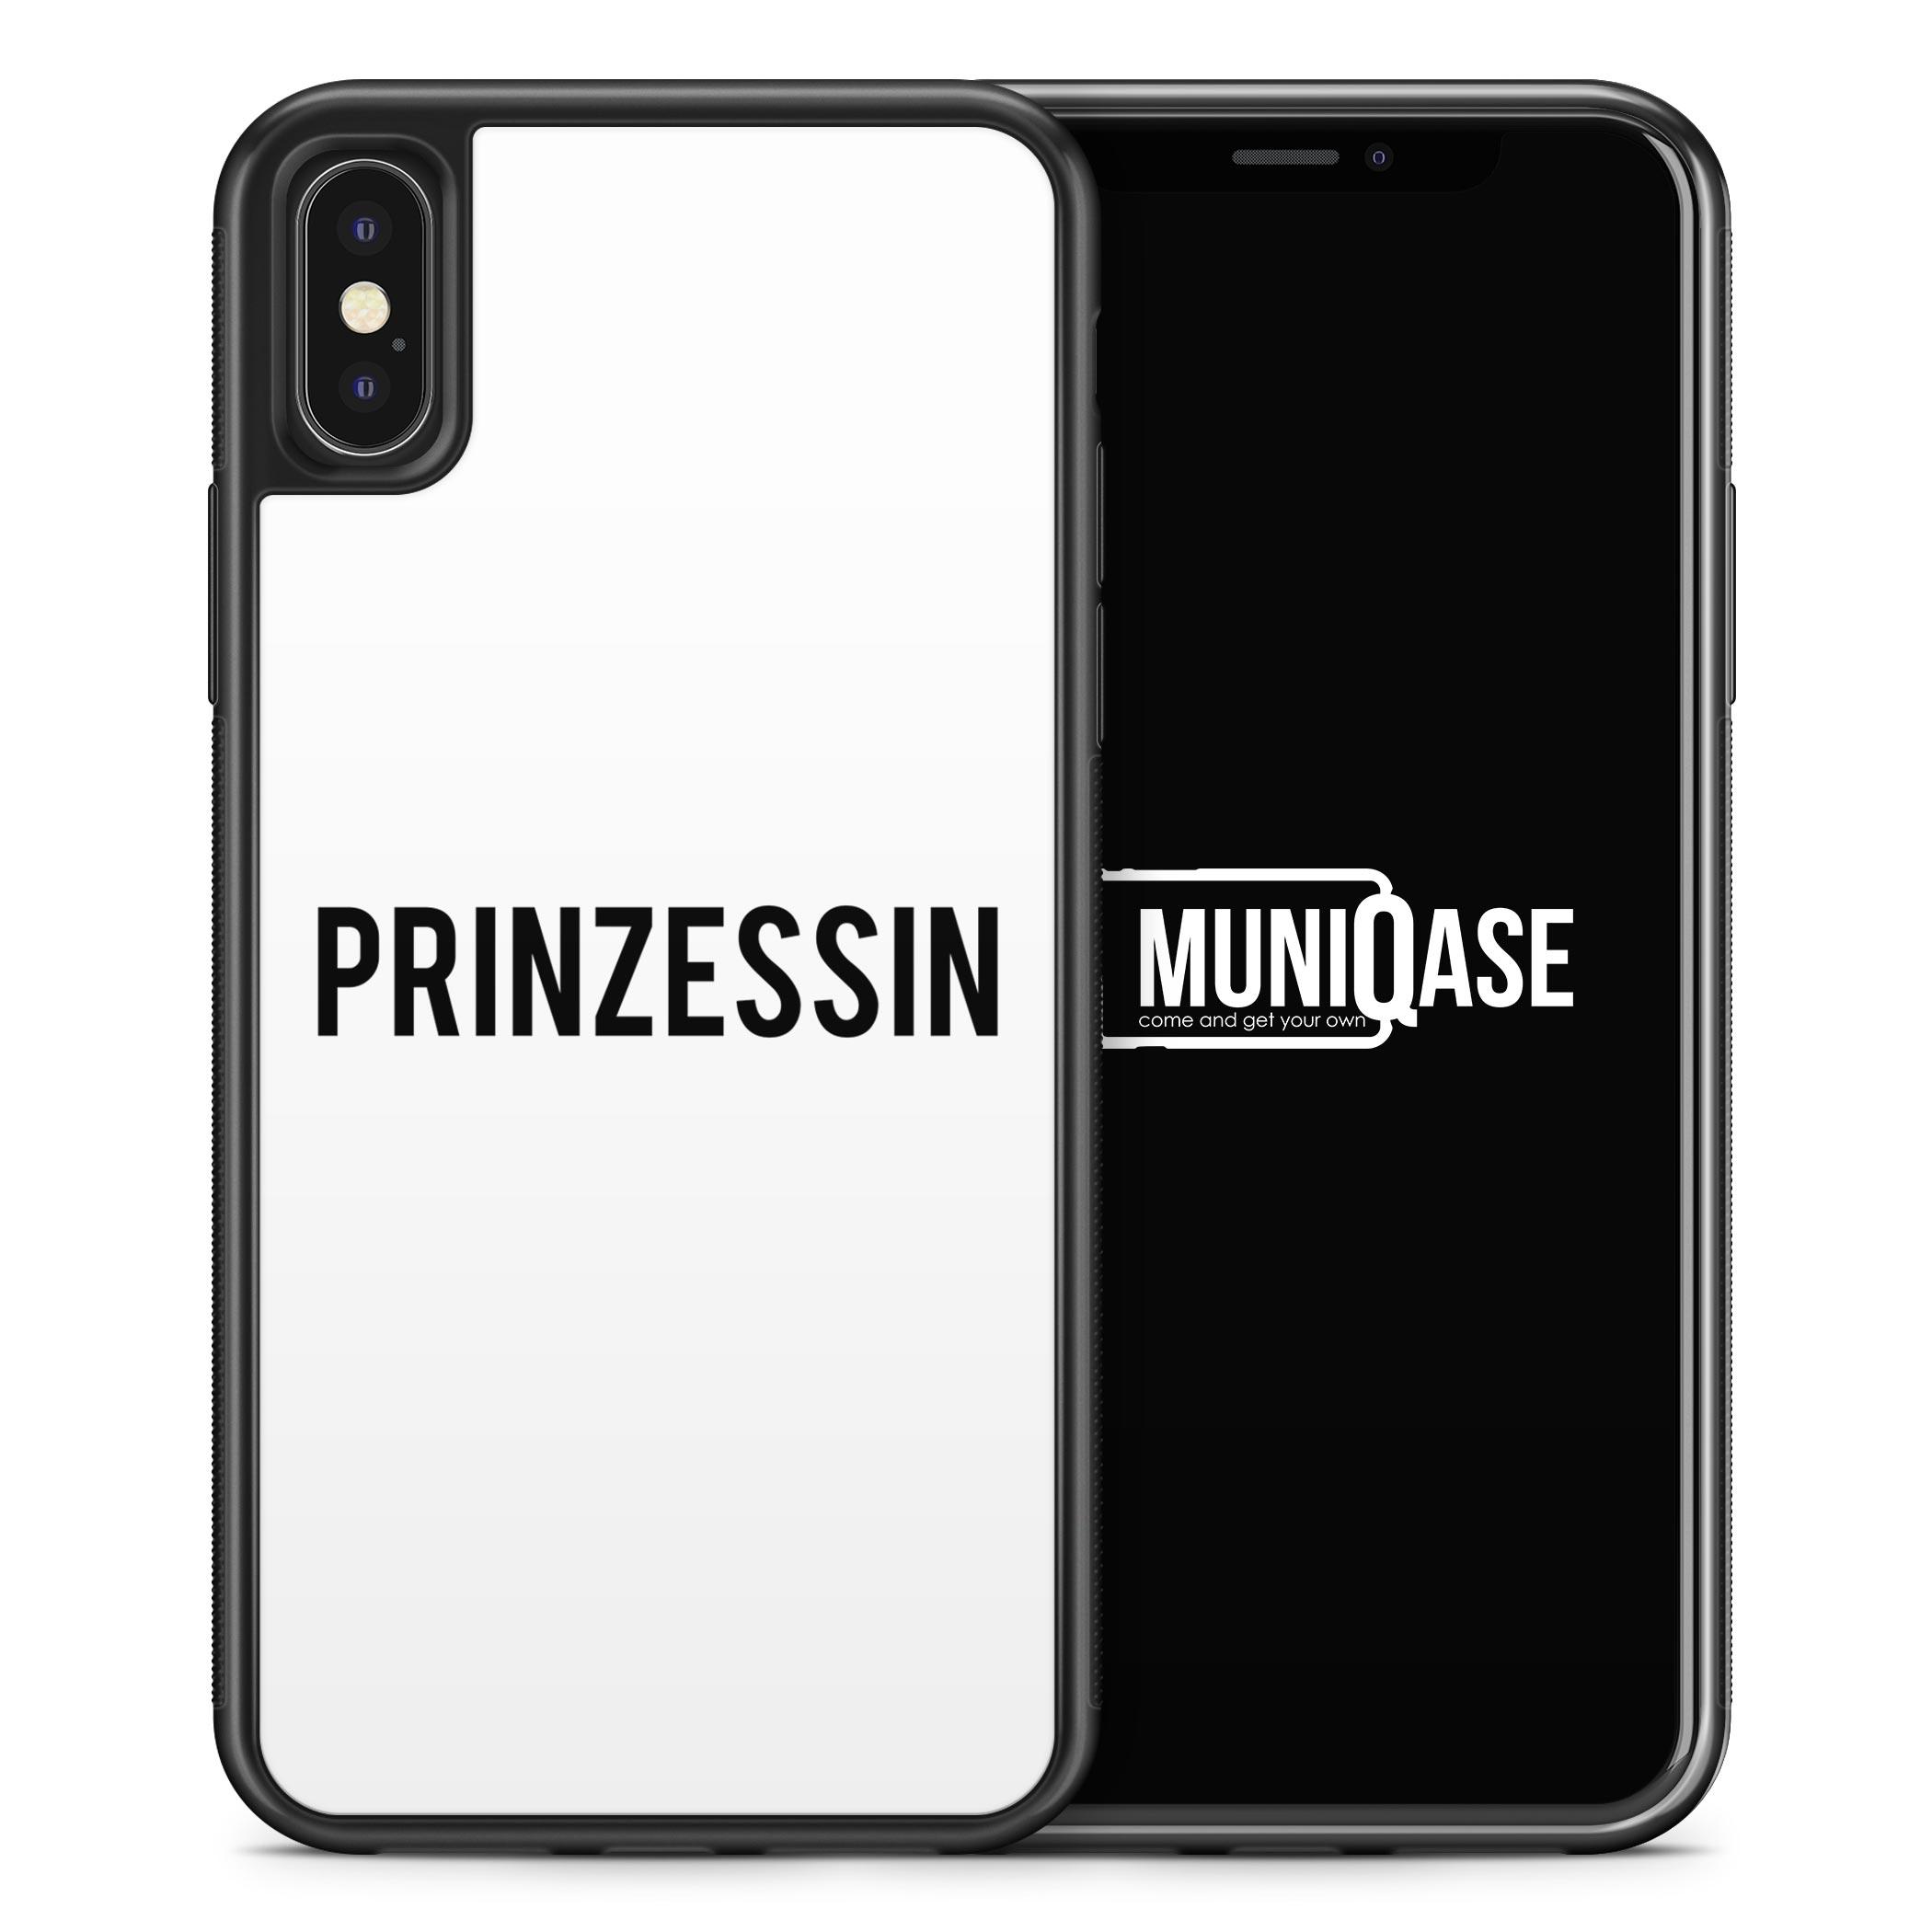 iPhone X Hülle SILIKON - Prinzessin WT